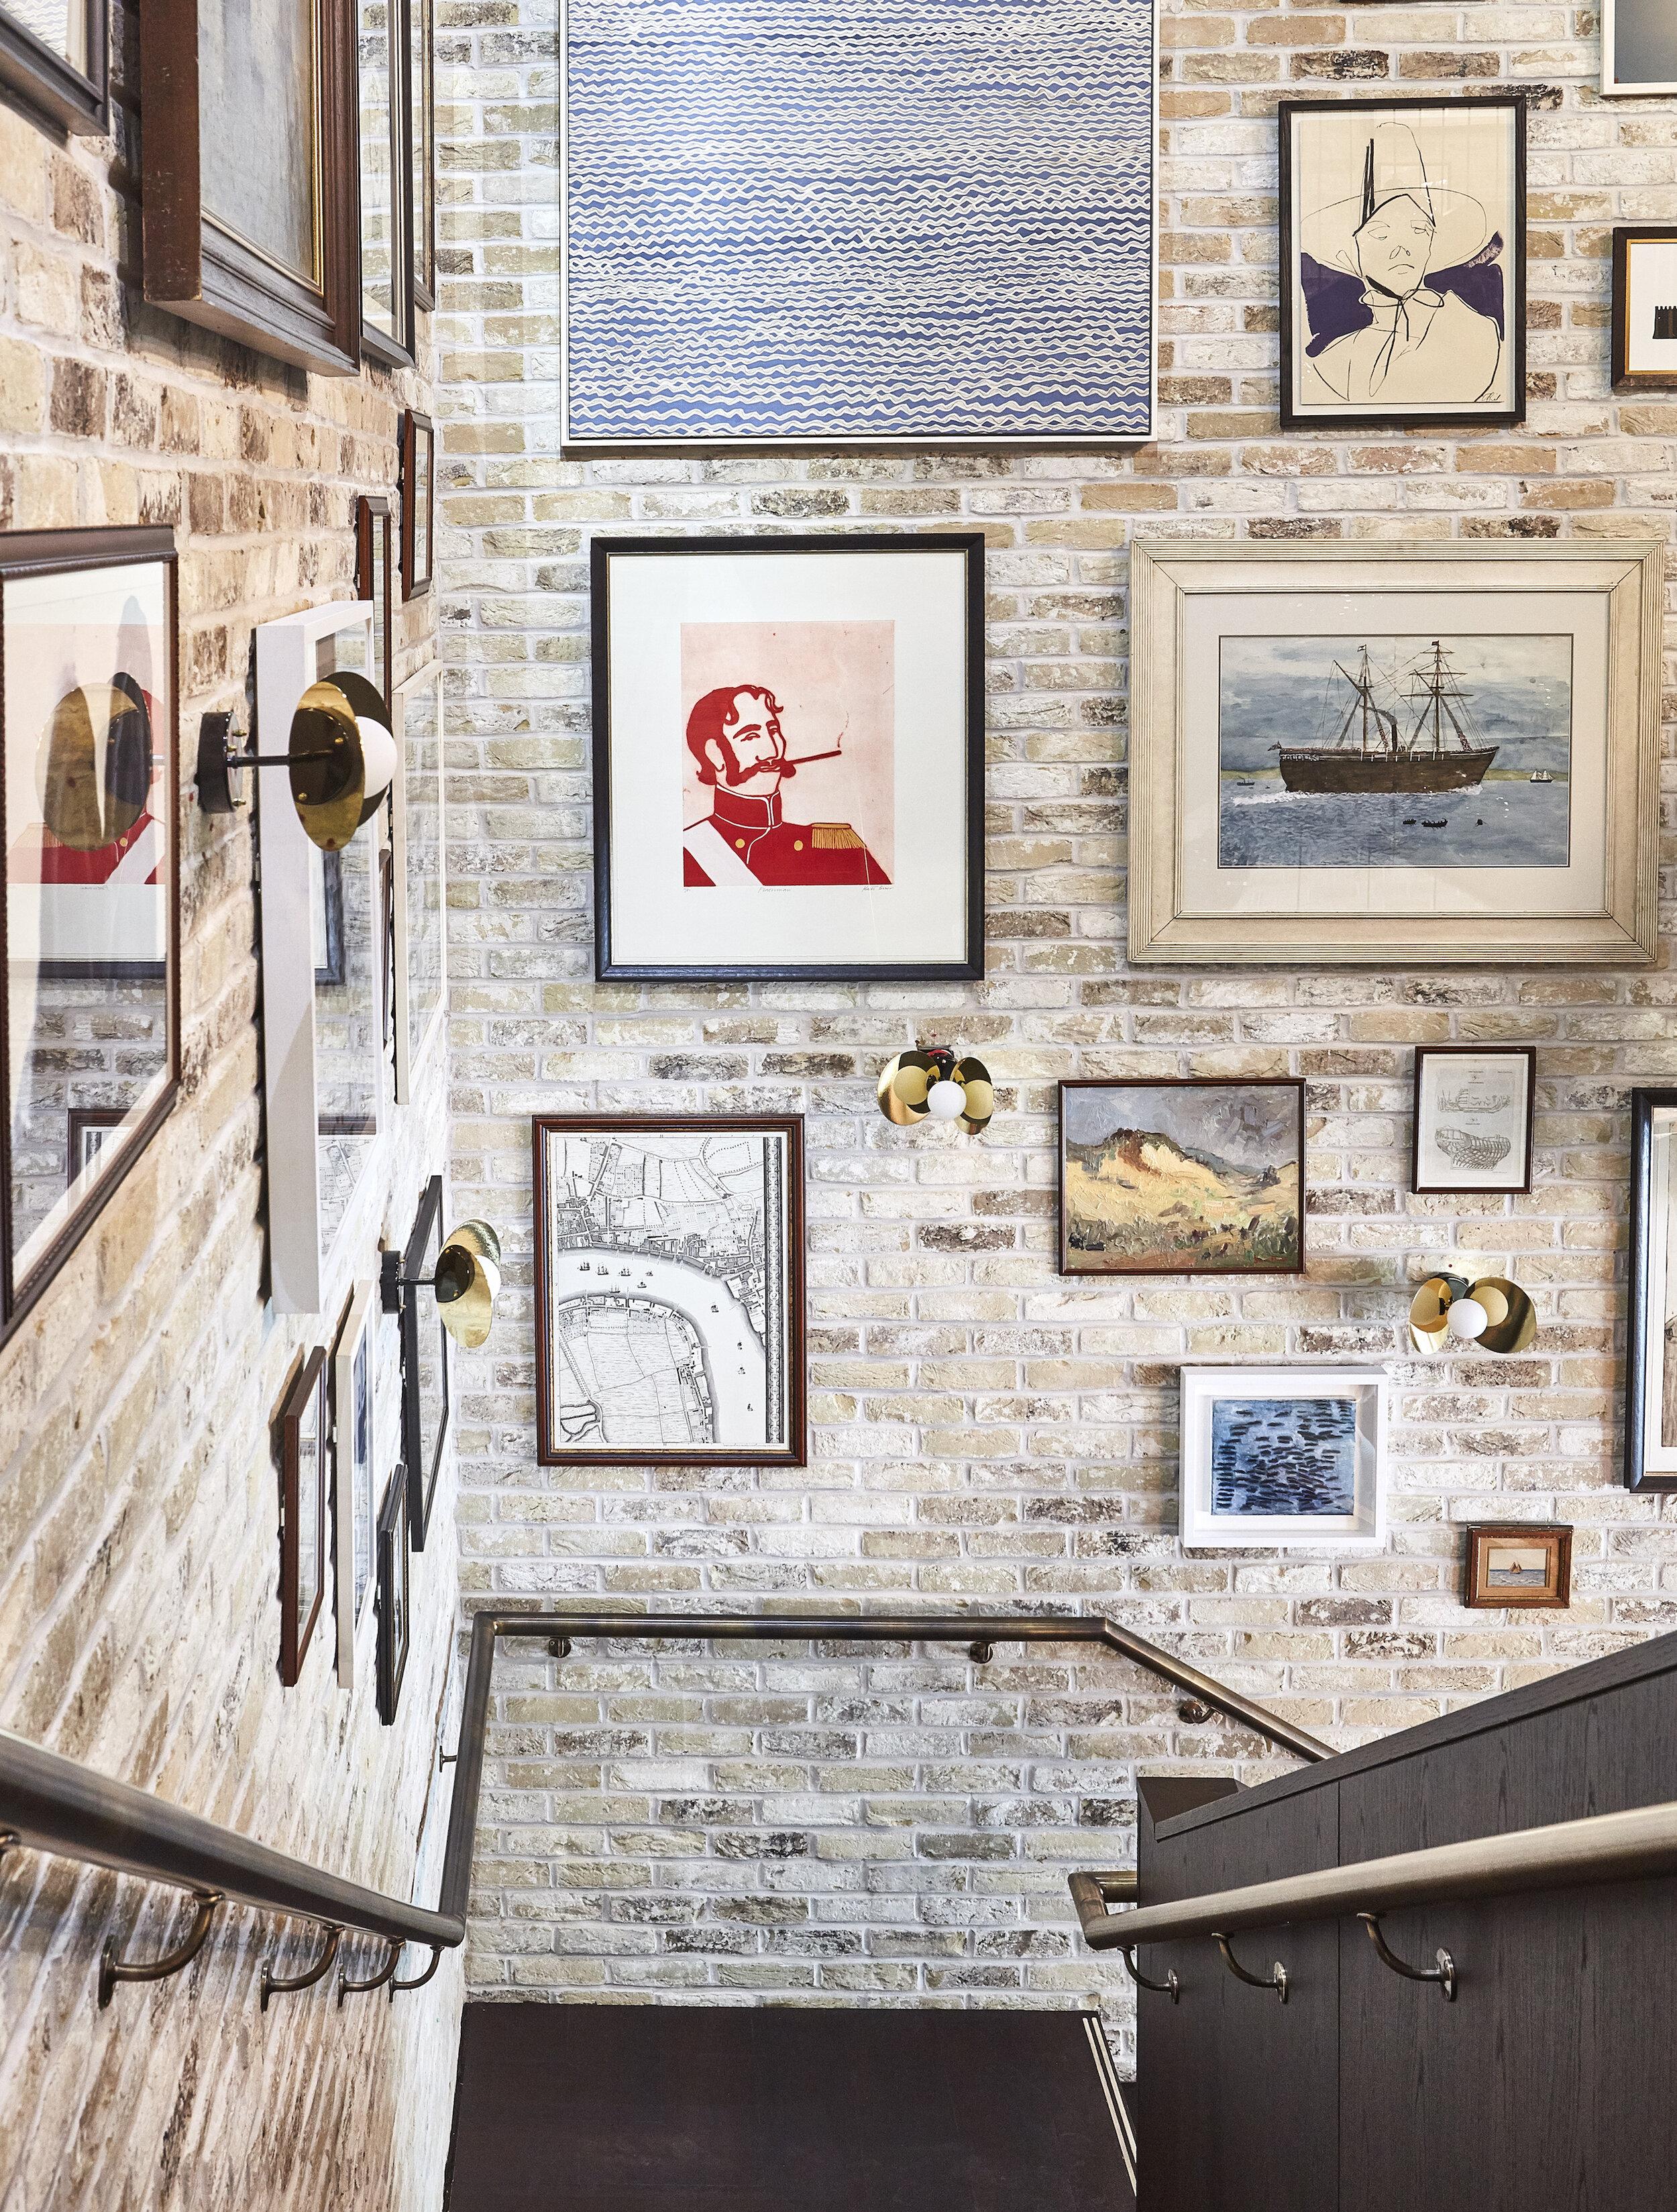 The Hoxton | Southwark   Stairwell - Mixed Media      Interior Design & Architecture: Ennismore